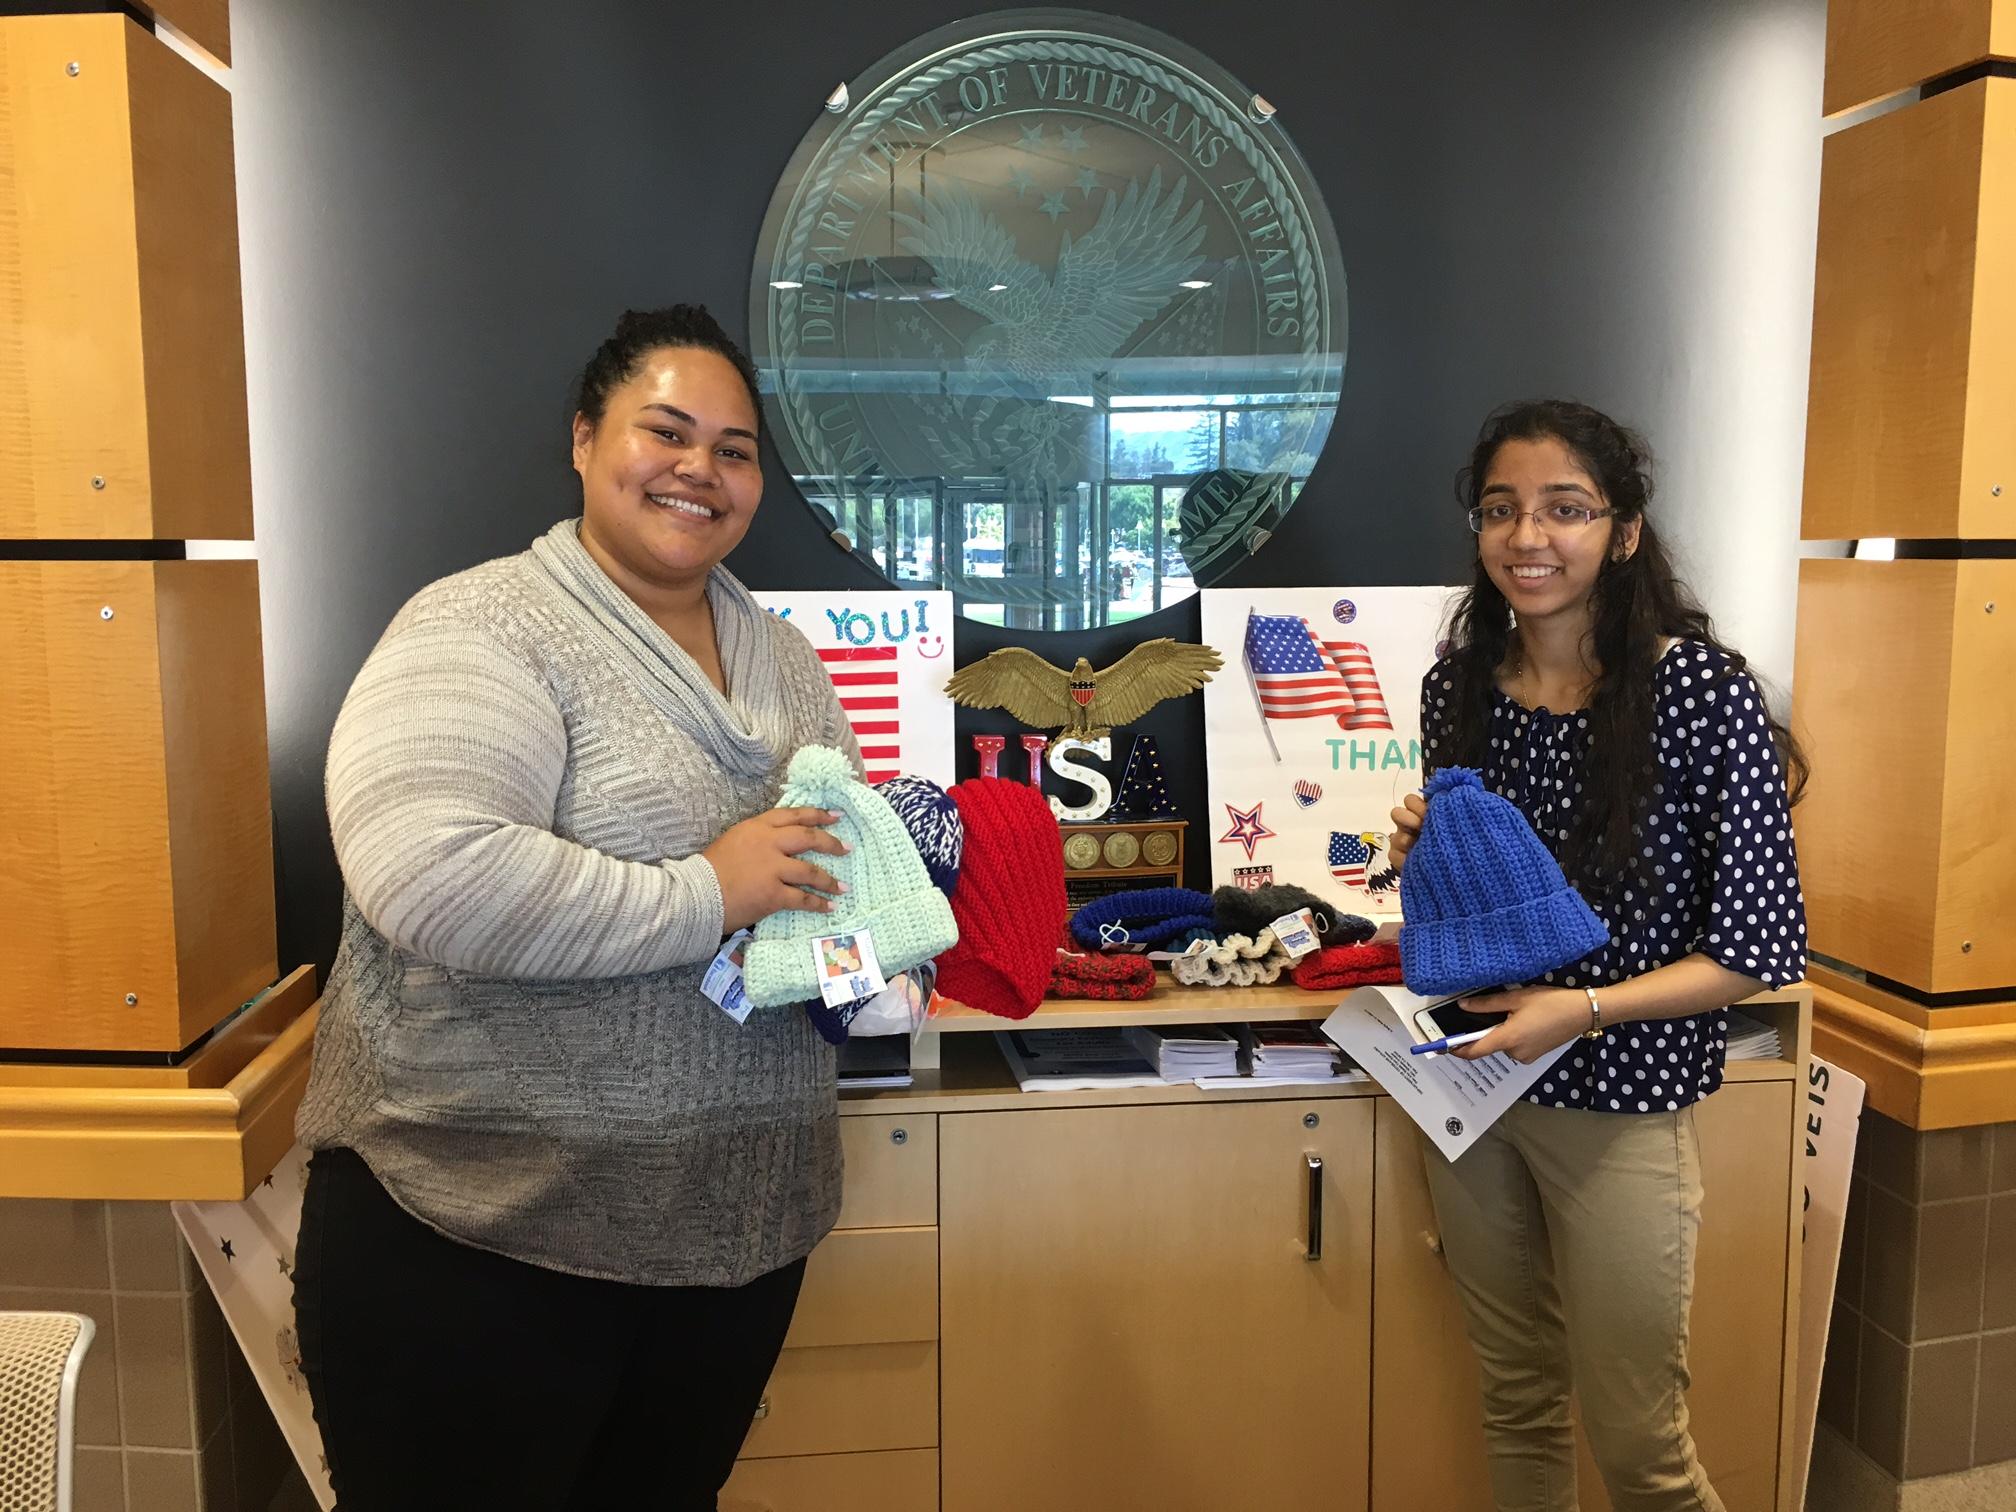 Mythri making a donation at the Veterans Affairs Hospital, Palo Alto